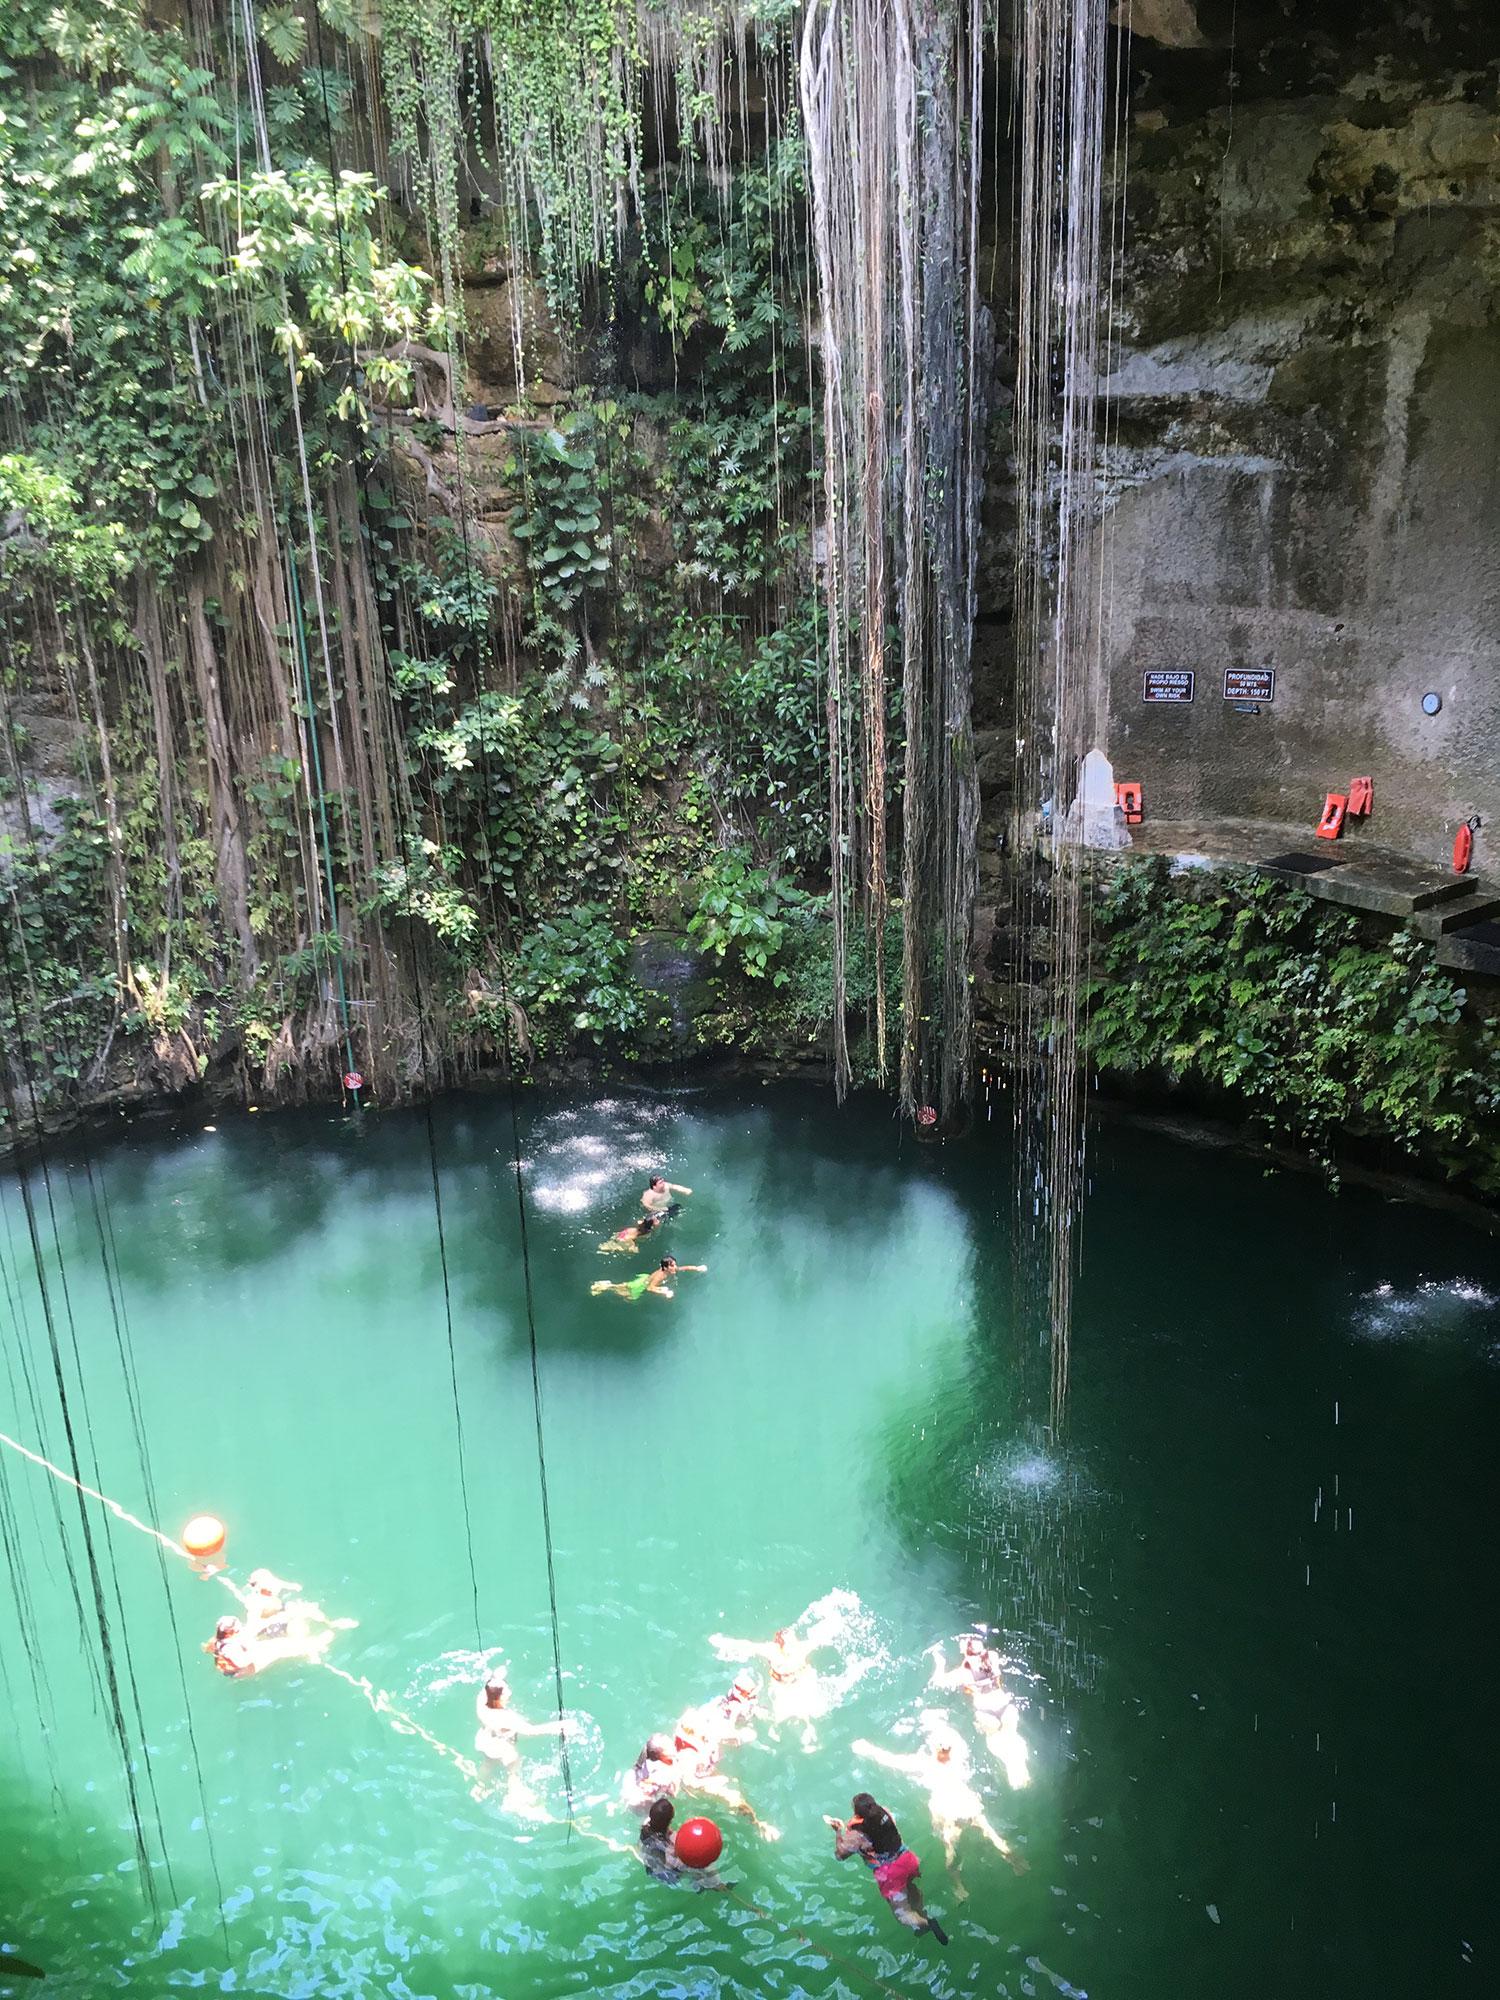 Hammocks_and_Ruins_What_to_Do_Mexico_Mayan_pyramid_cenote_Ik_Kil_31.jpg